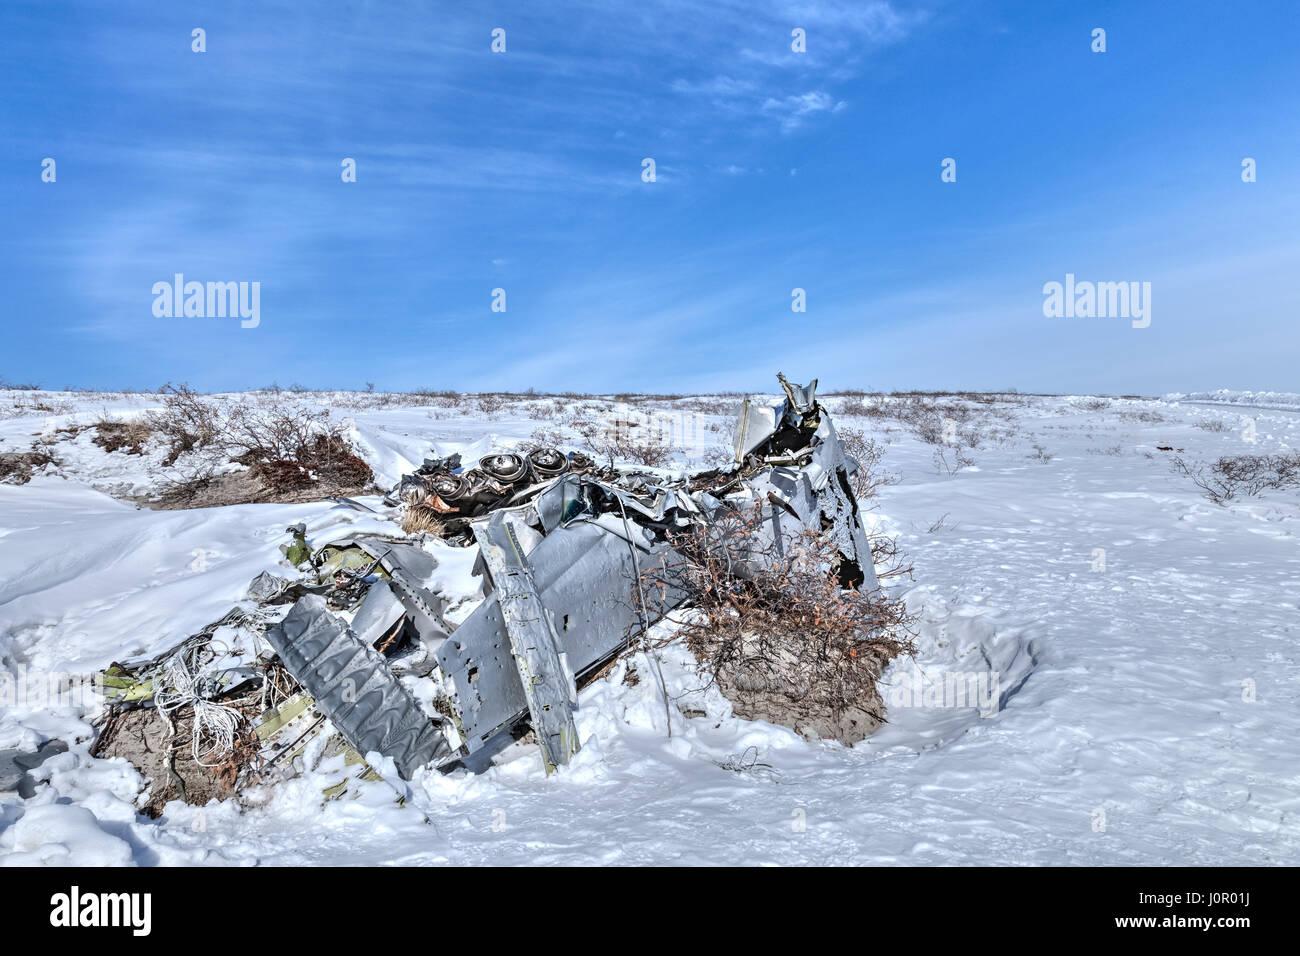 Plane wreck near Kangerlussuaq, Artic Circle, Greenland, Europe Stock Photo